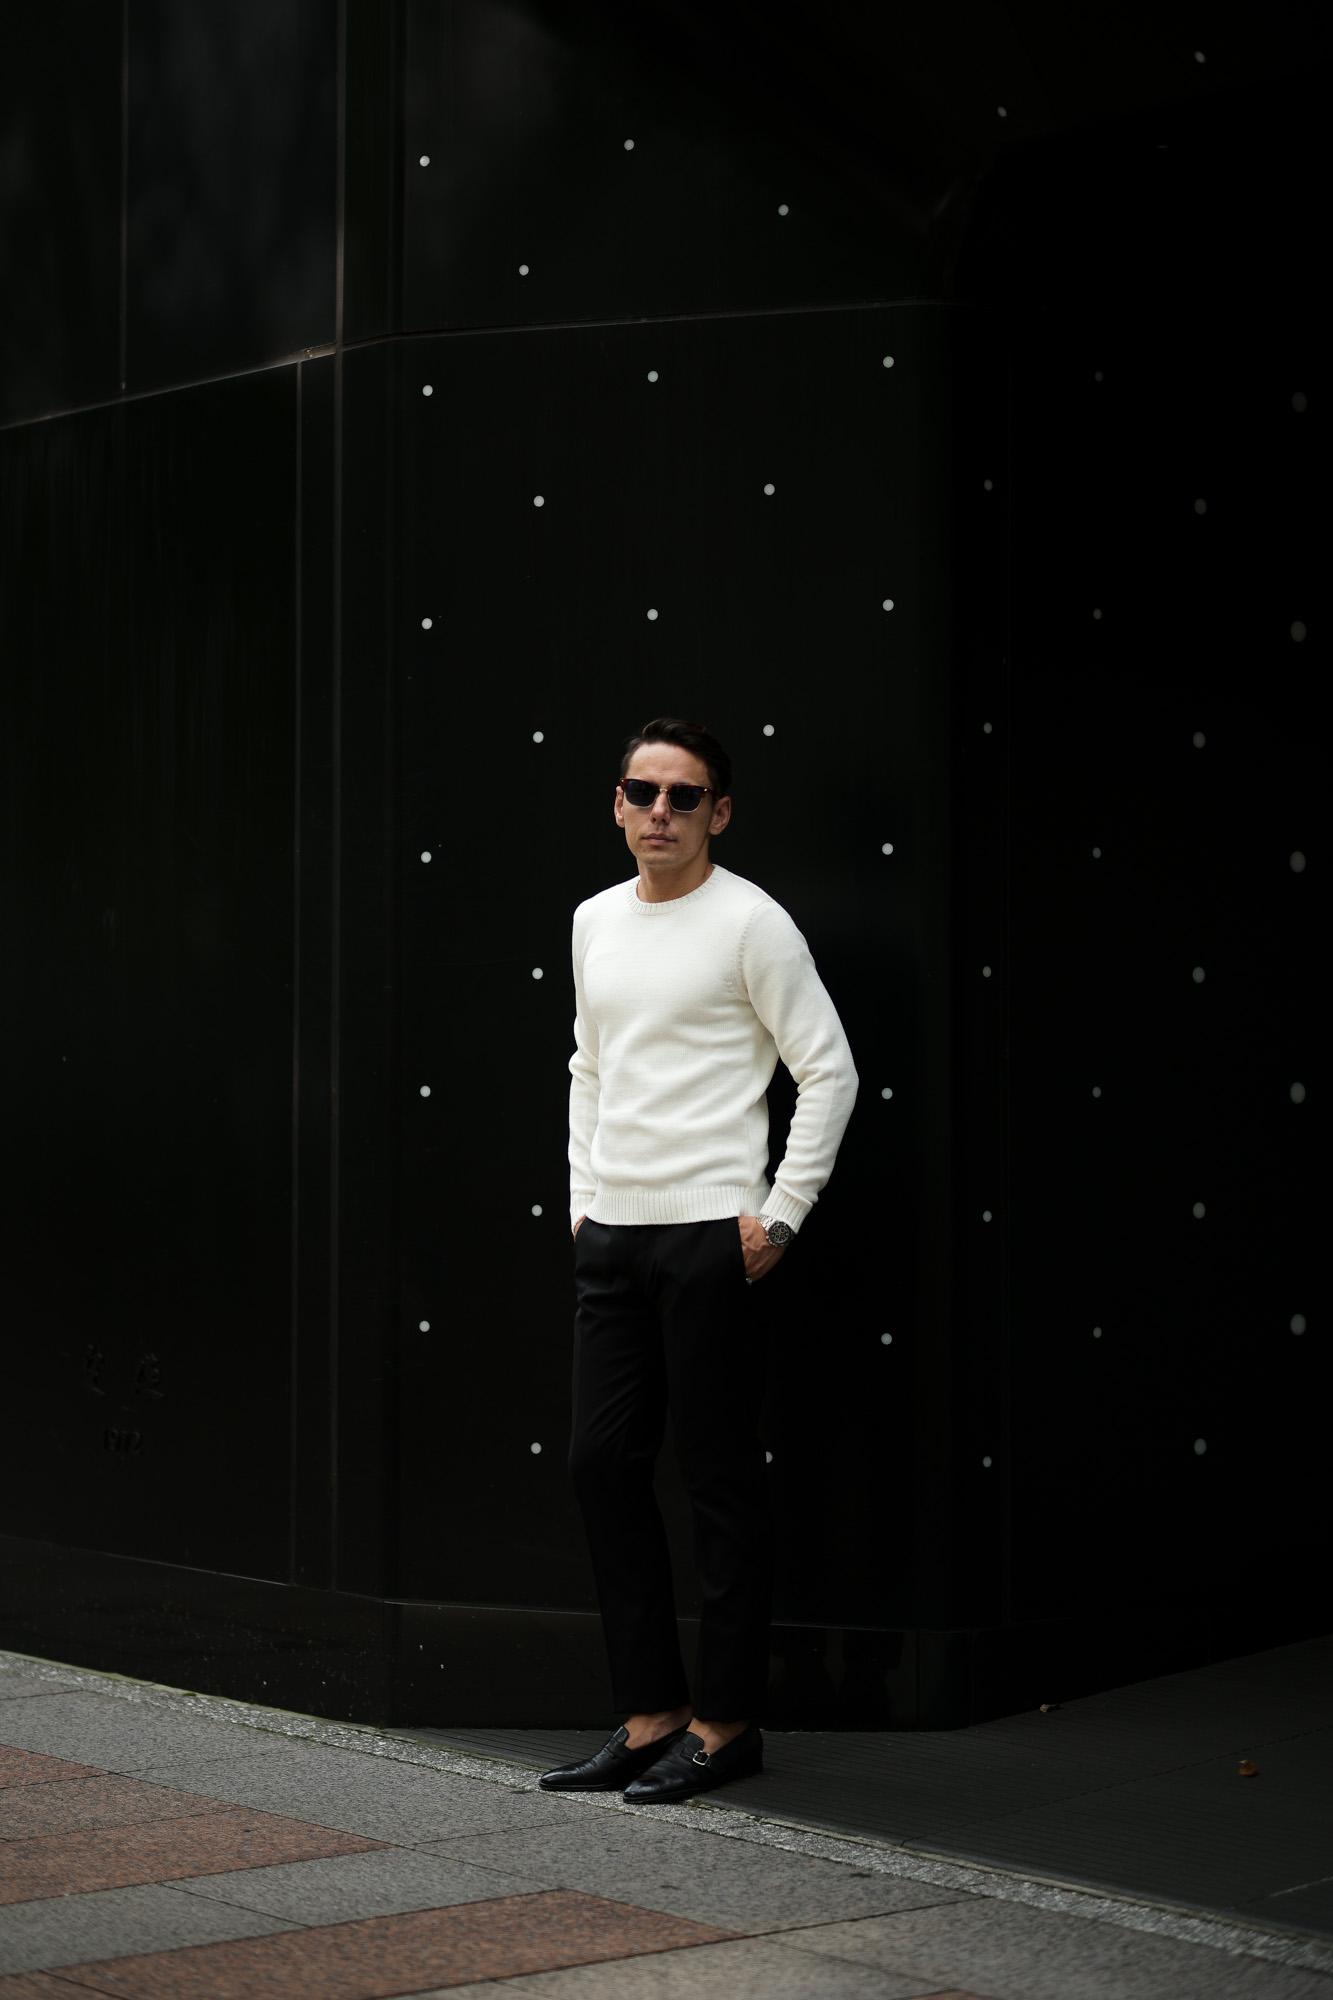 ZANONE(ザノーネ) Crew Neck Sweater (クルーネック セーター) VIRGIN WOOL 100% ミドルゲージ ウールニット セーター WHITE (ホワイト・Z3623) made in italy (イタリア製) 2020 秋冬 【ご予約受付中】愛知 名古屋 altoediritto アルトエデリット タートル